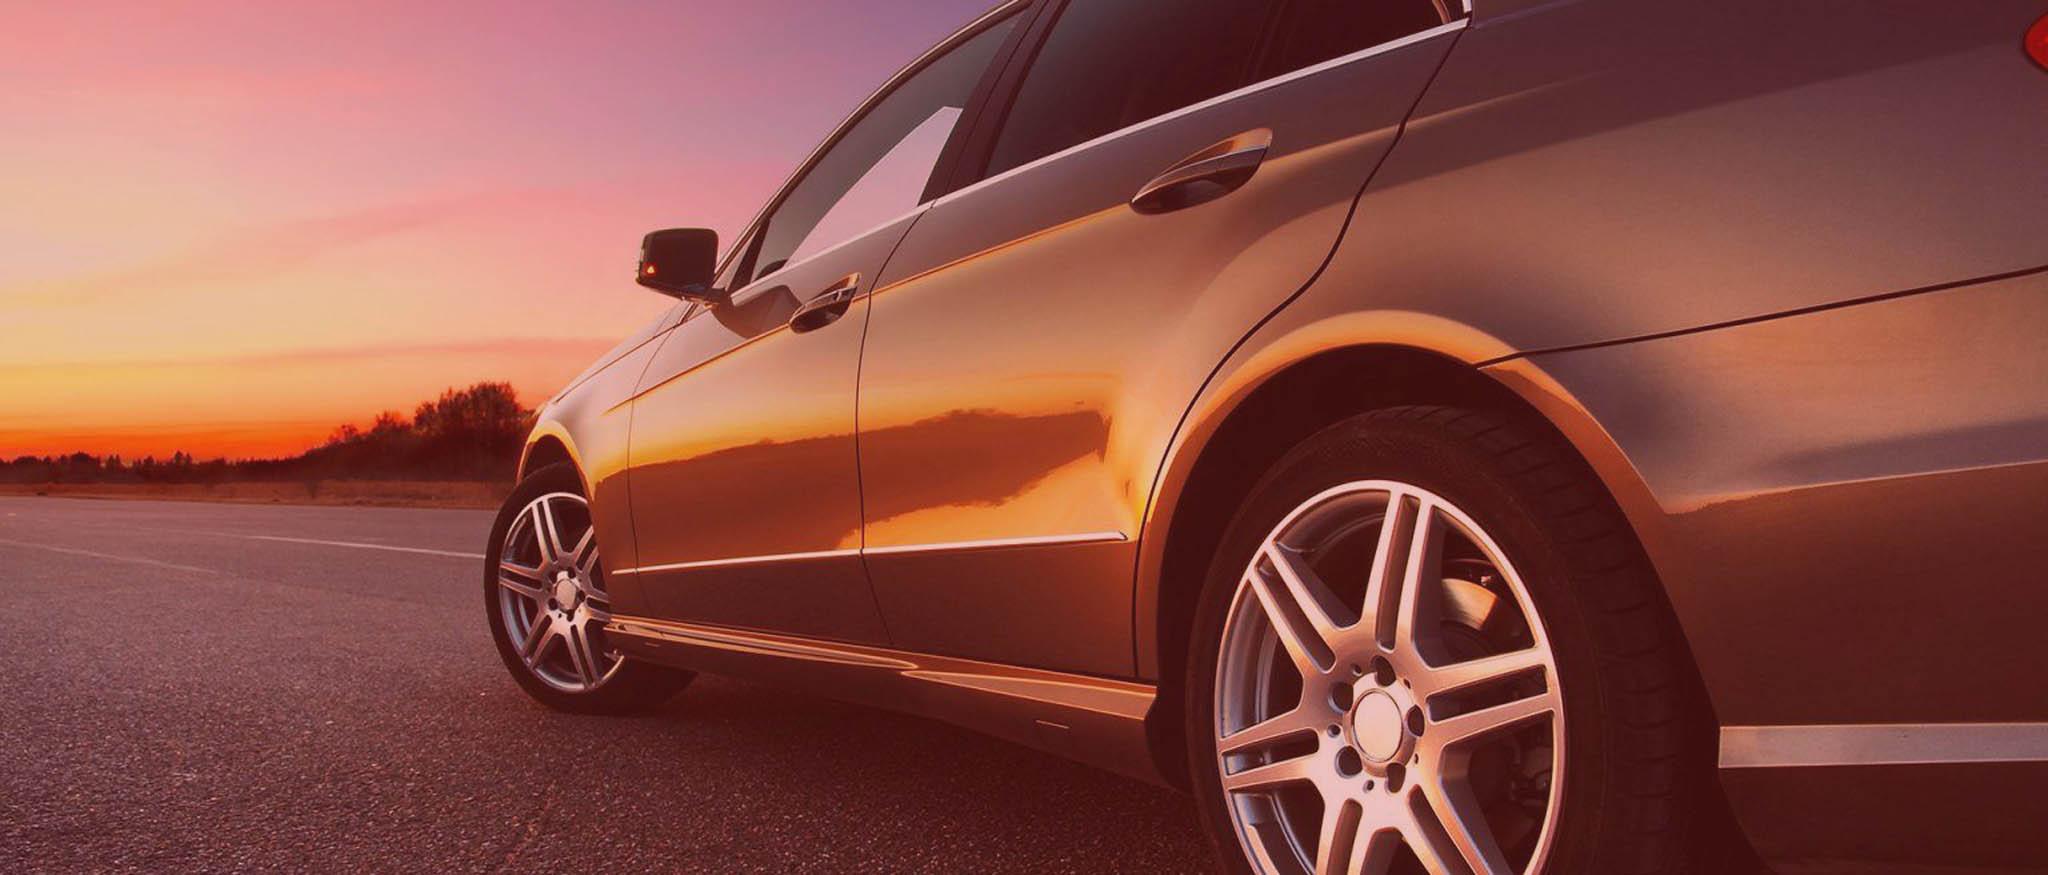 Hintergrund Auto mit Overlay